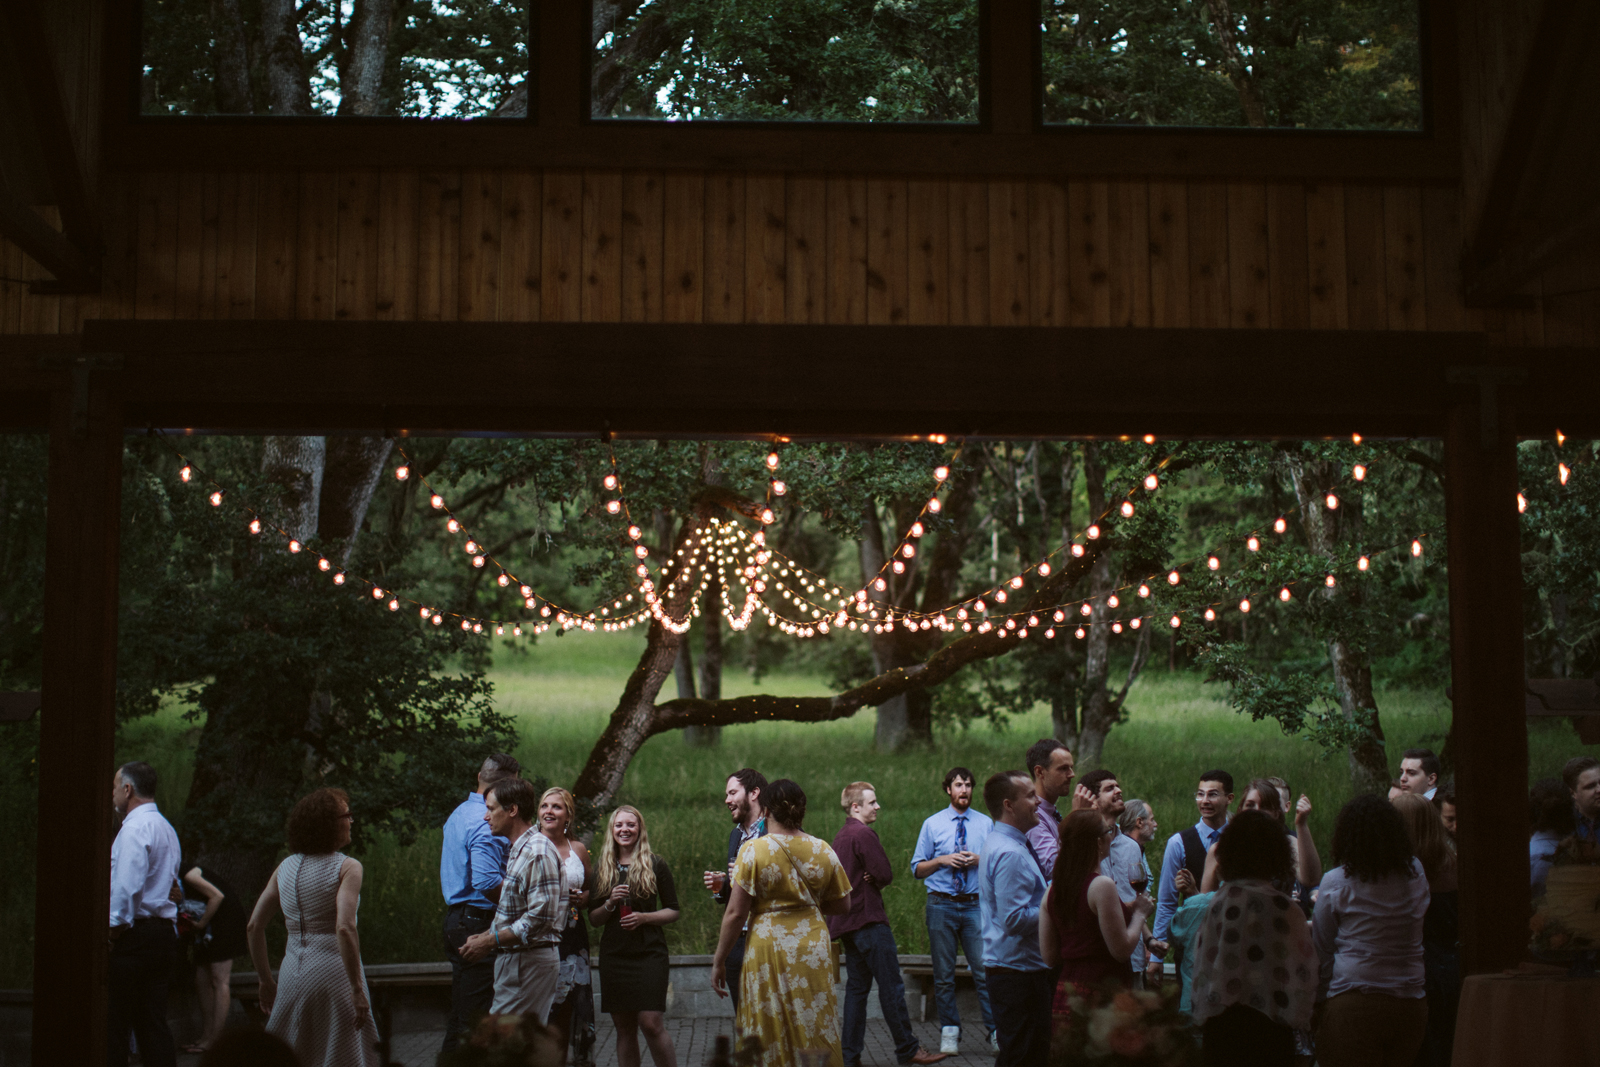 142-daronjackson-rachel-michael-wedding-mtpisgah.jpg